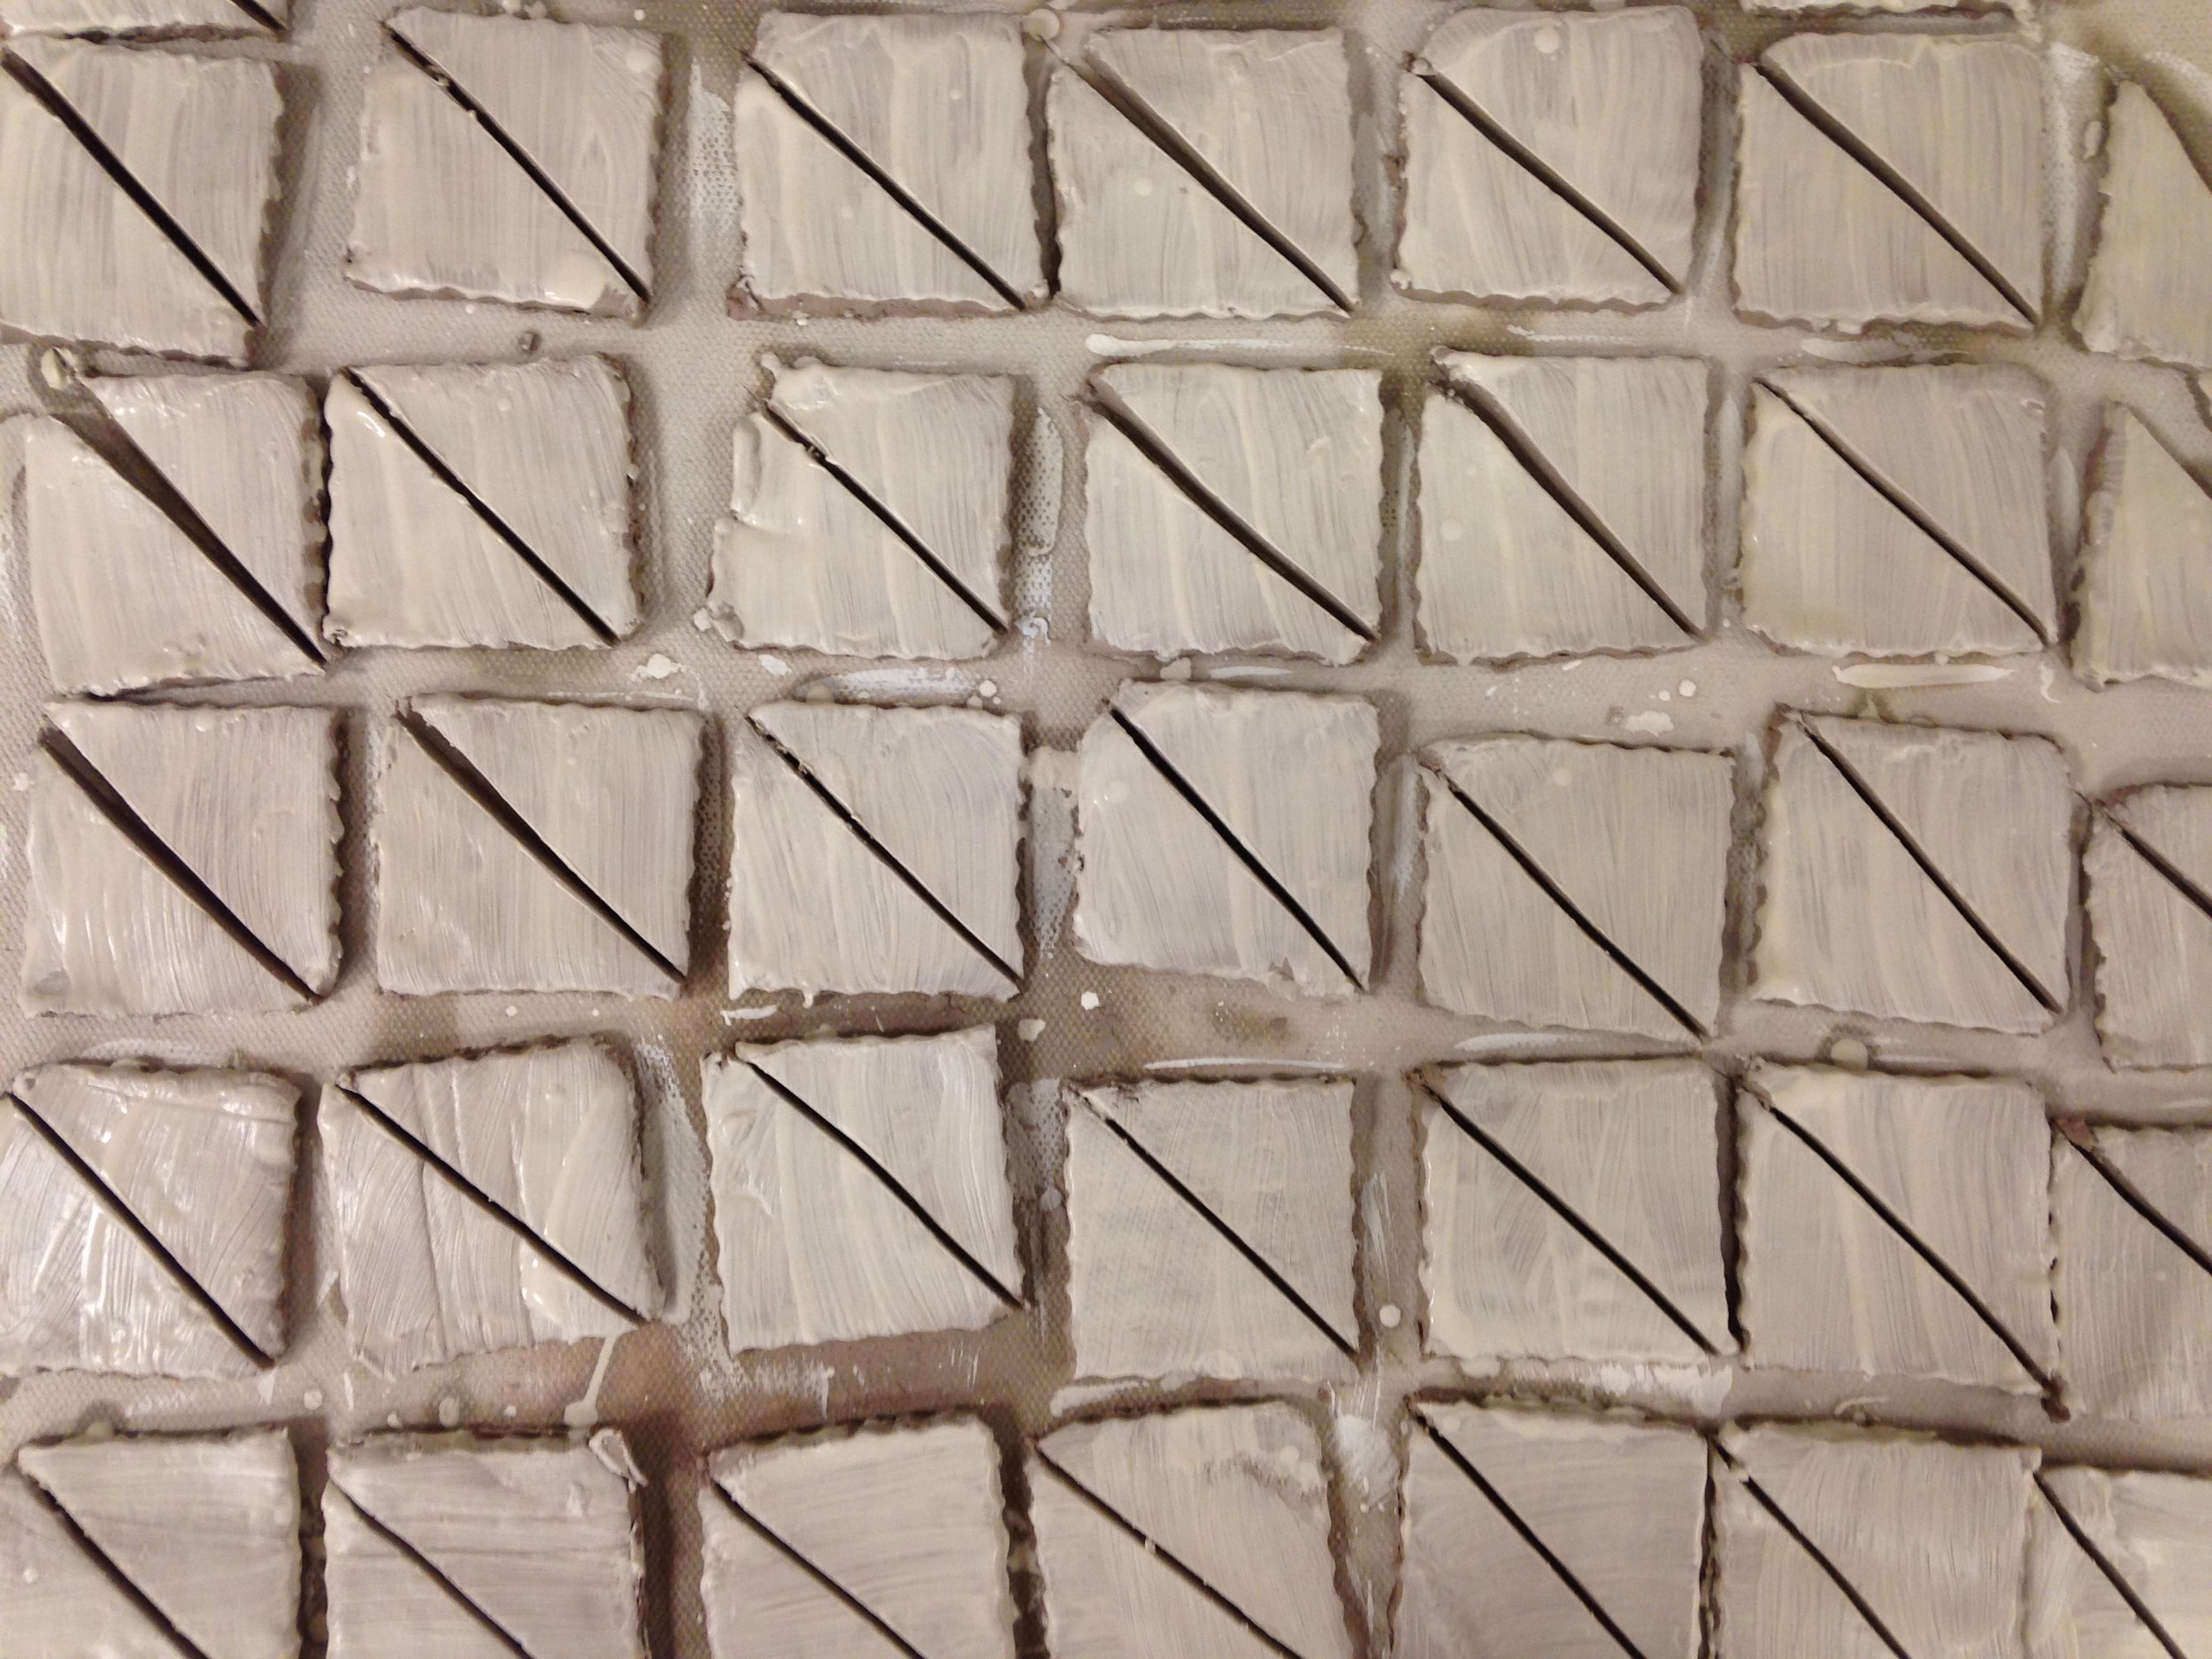 Making test tiles